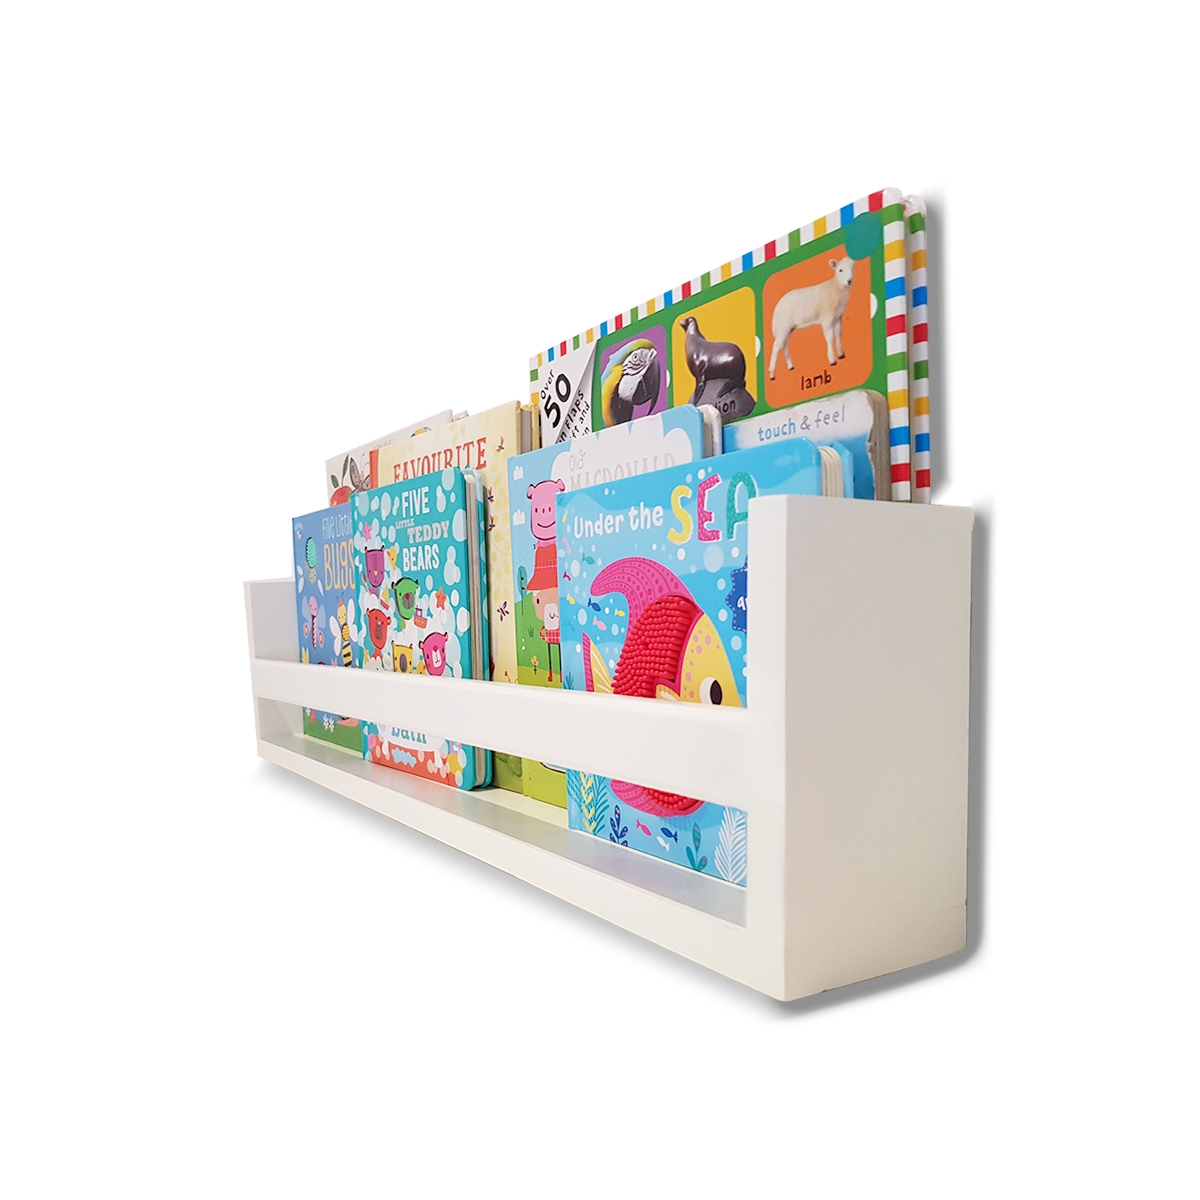 Bookshelf Deep-etched 2